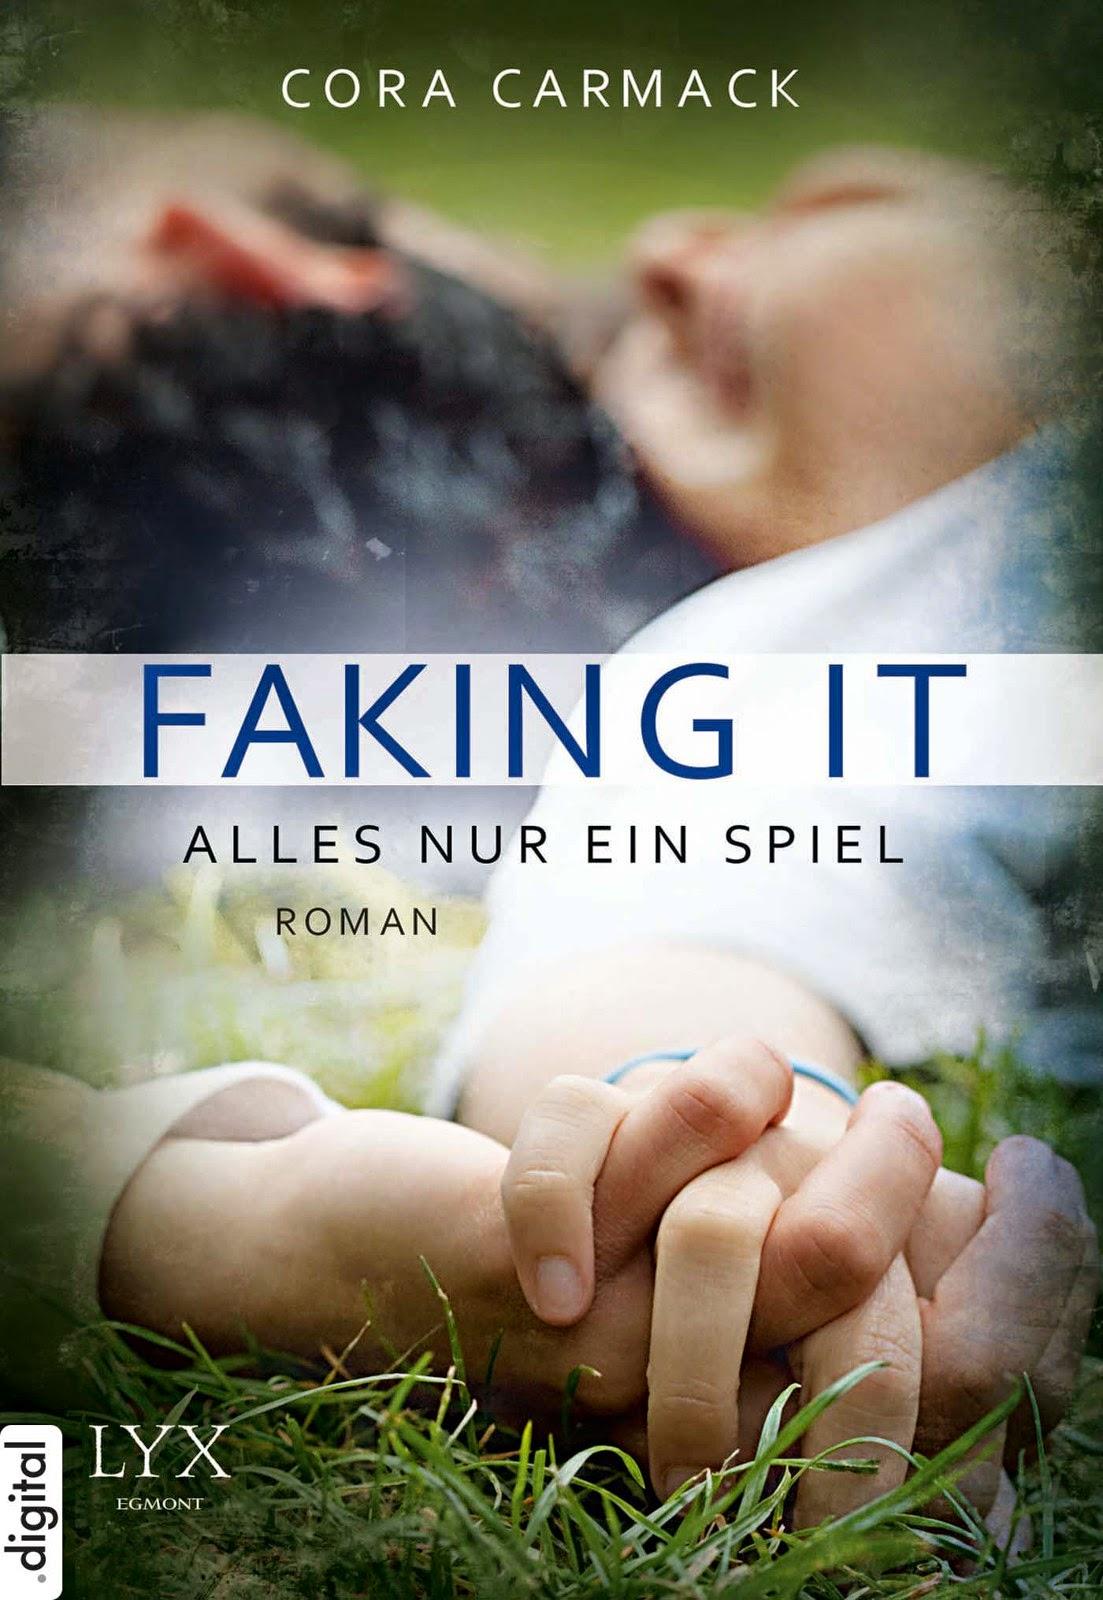 http://www.amazon.de/Faking-Alles-nur-ein-Spiel-ebook/dp/B00JQQP8S8/ref=sr_1_1_twi_2?ie=UTF8&qid=1413125053&sr=8-1&keywords=faking+it